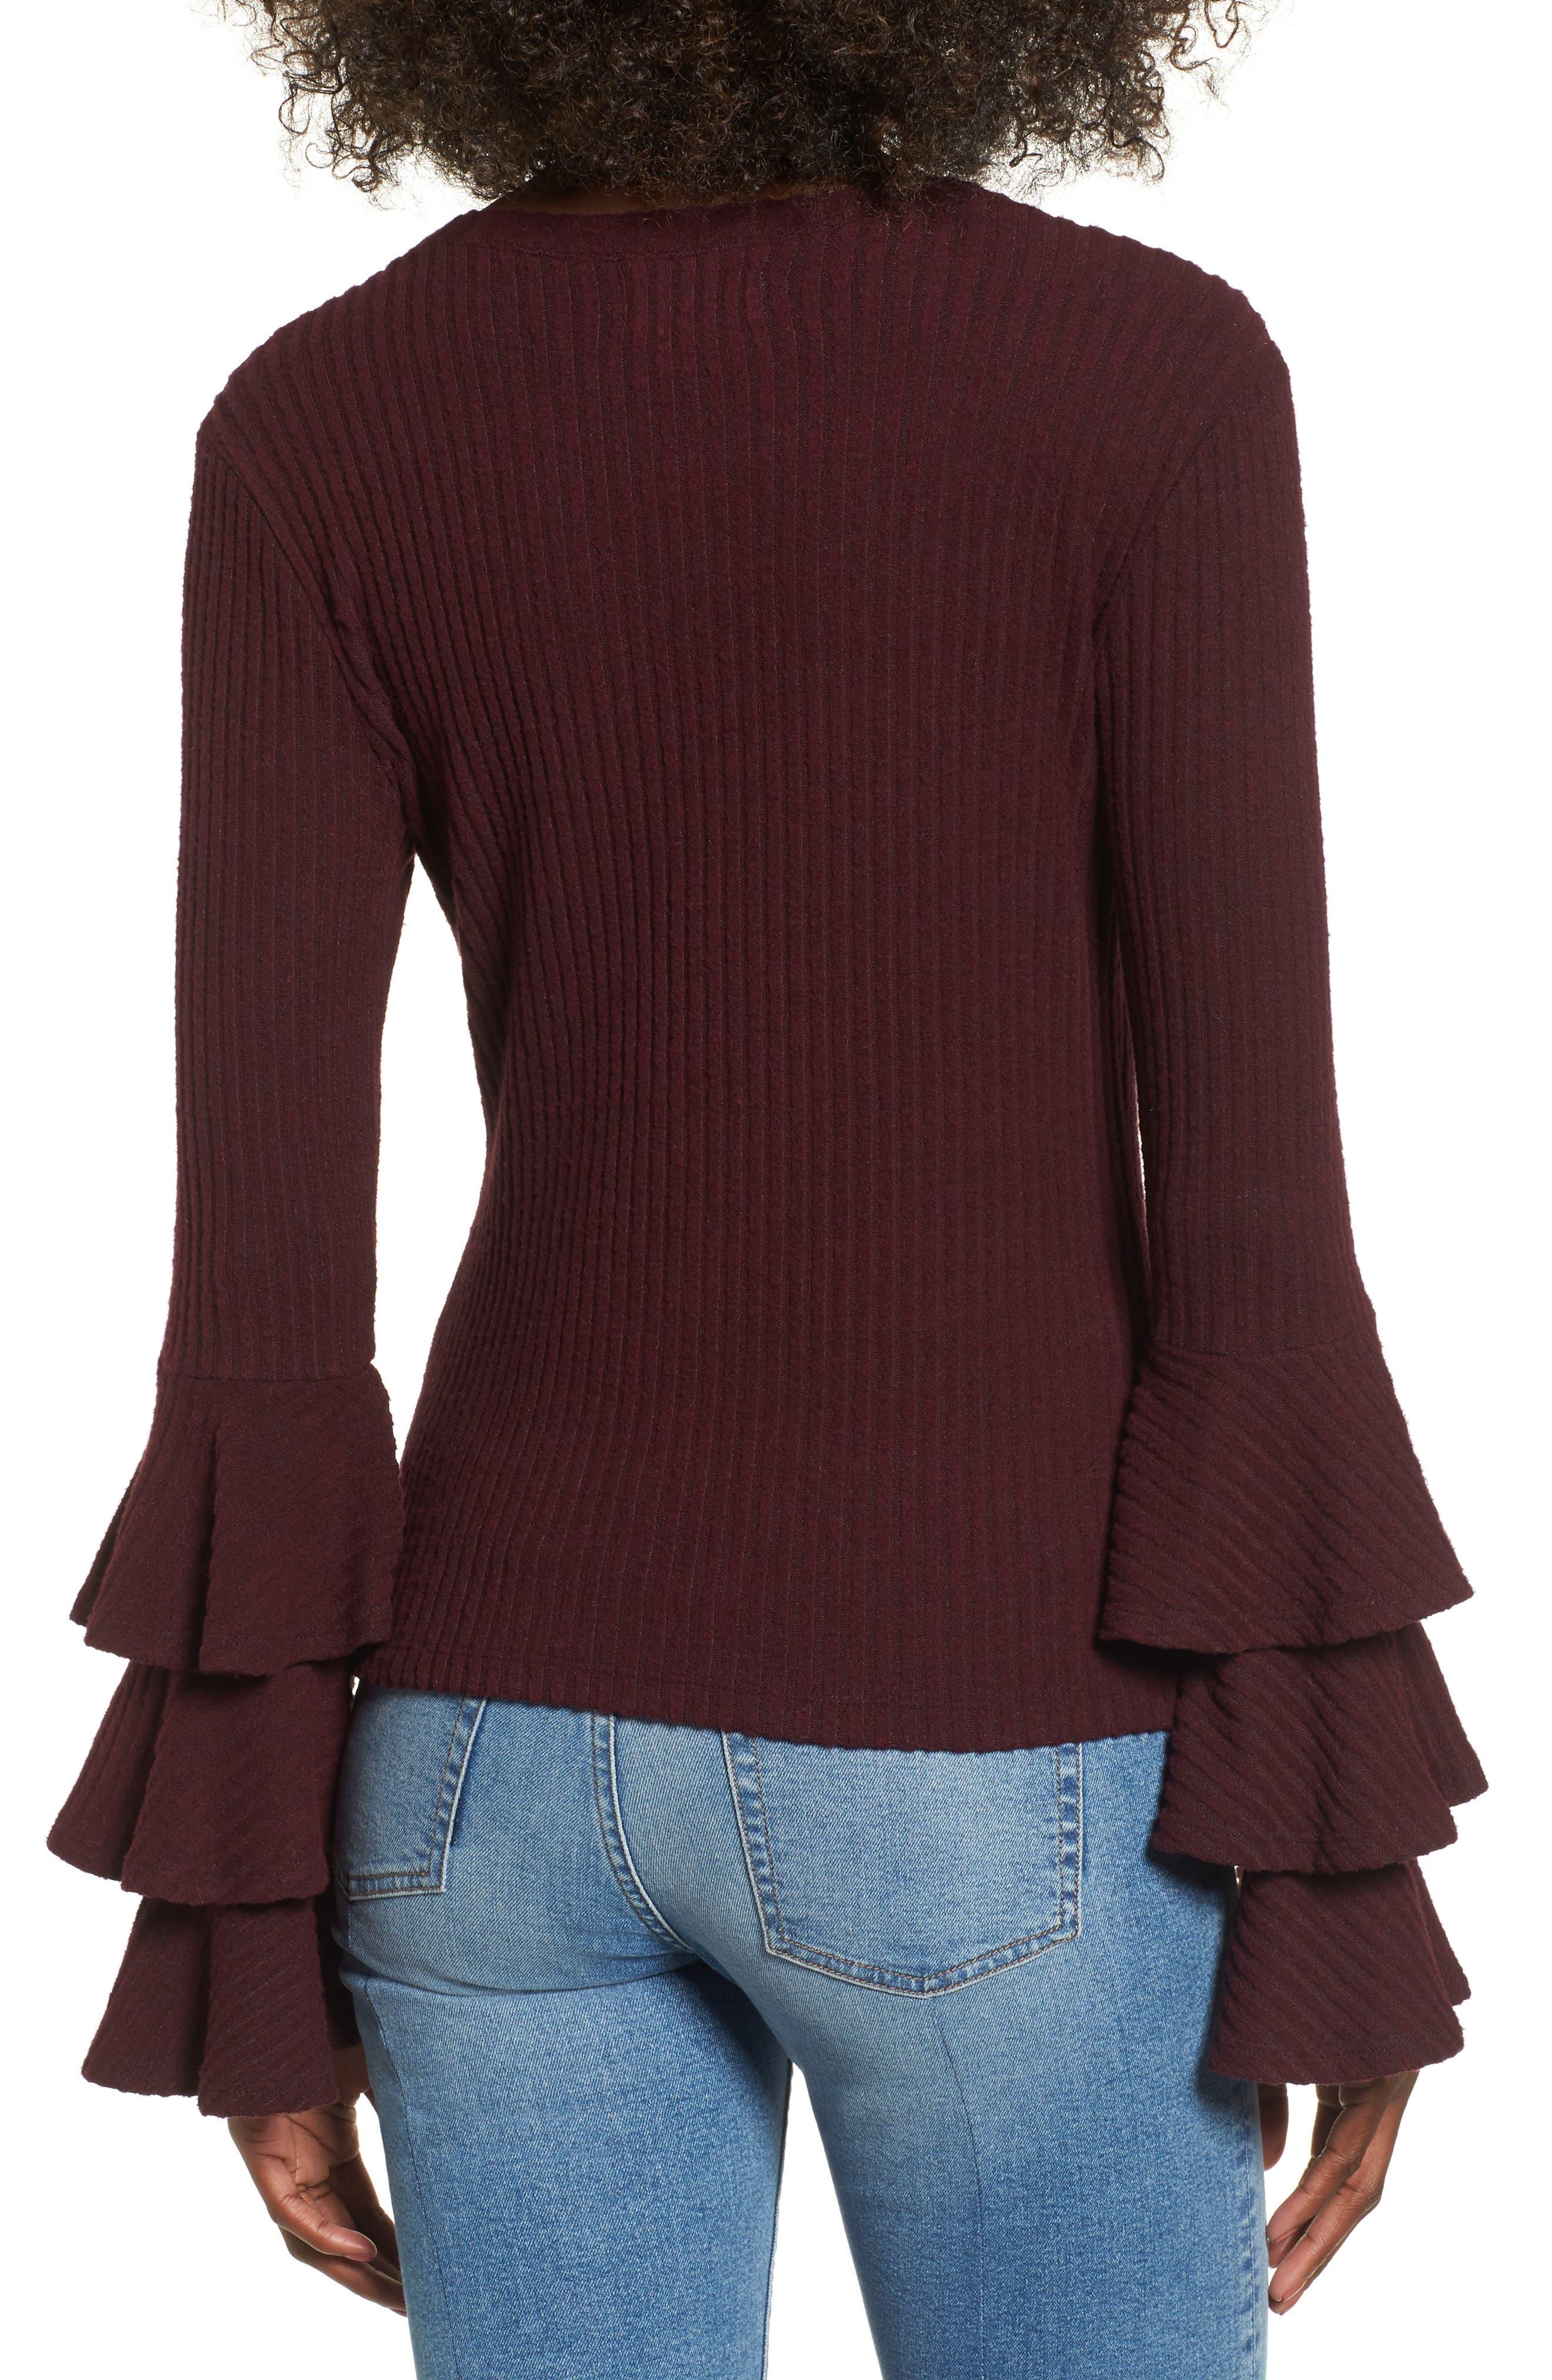 Marie Ruffle Sleeve Top,                             Alternate thumbnail 2, color,                             Burgundy